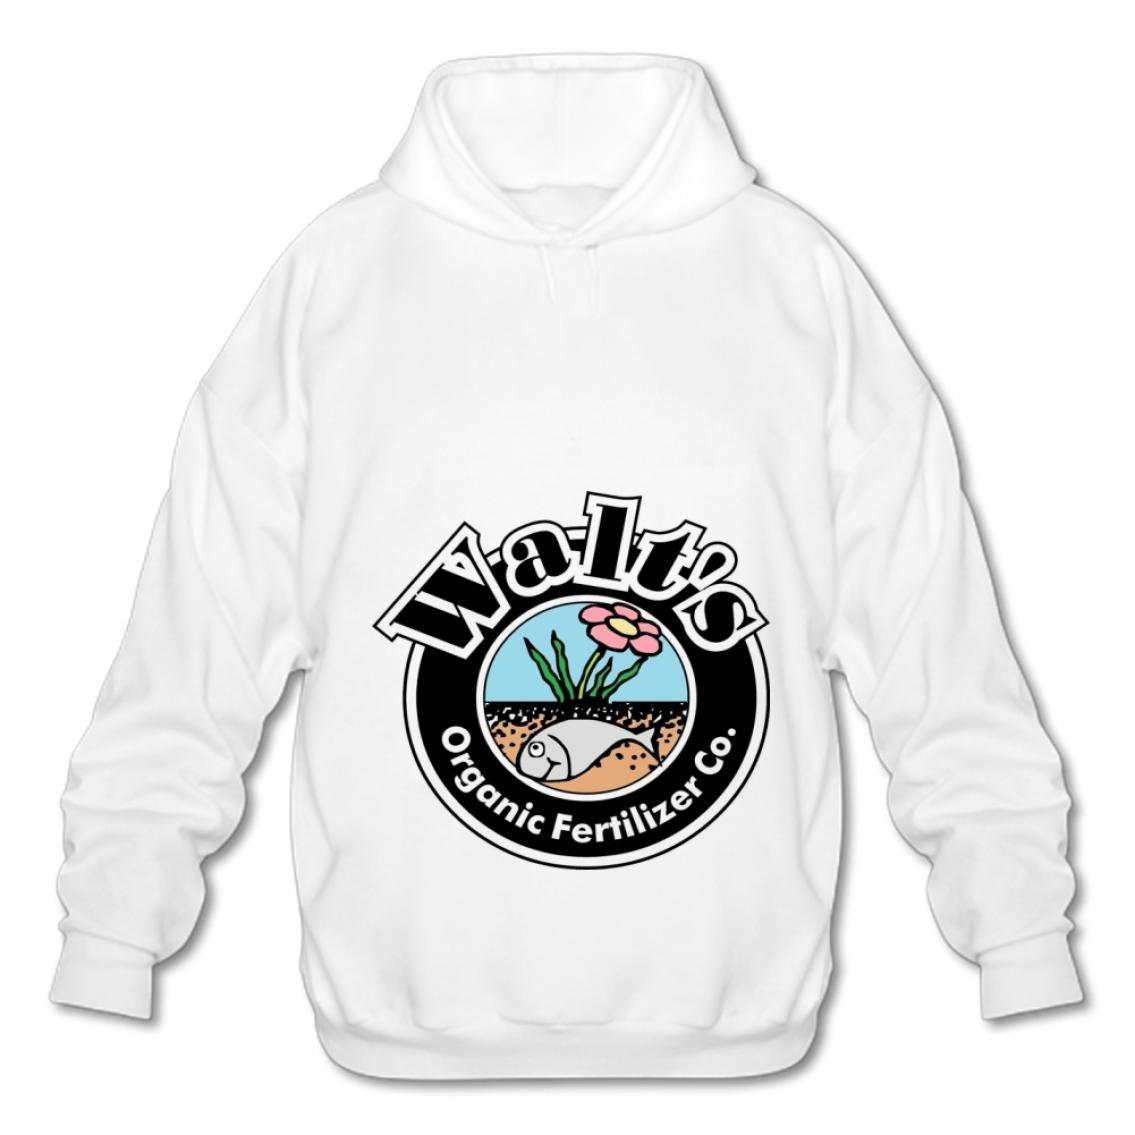 Ankaiqufbv Fashion Fashion Hoodies-01 Cartoon Soil xfkx Sweatshirt Mens Cotton Pullover Hoodies